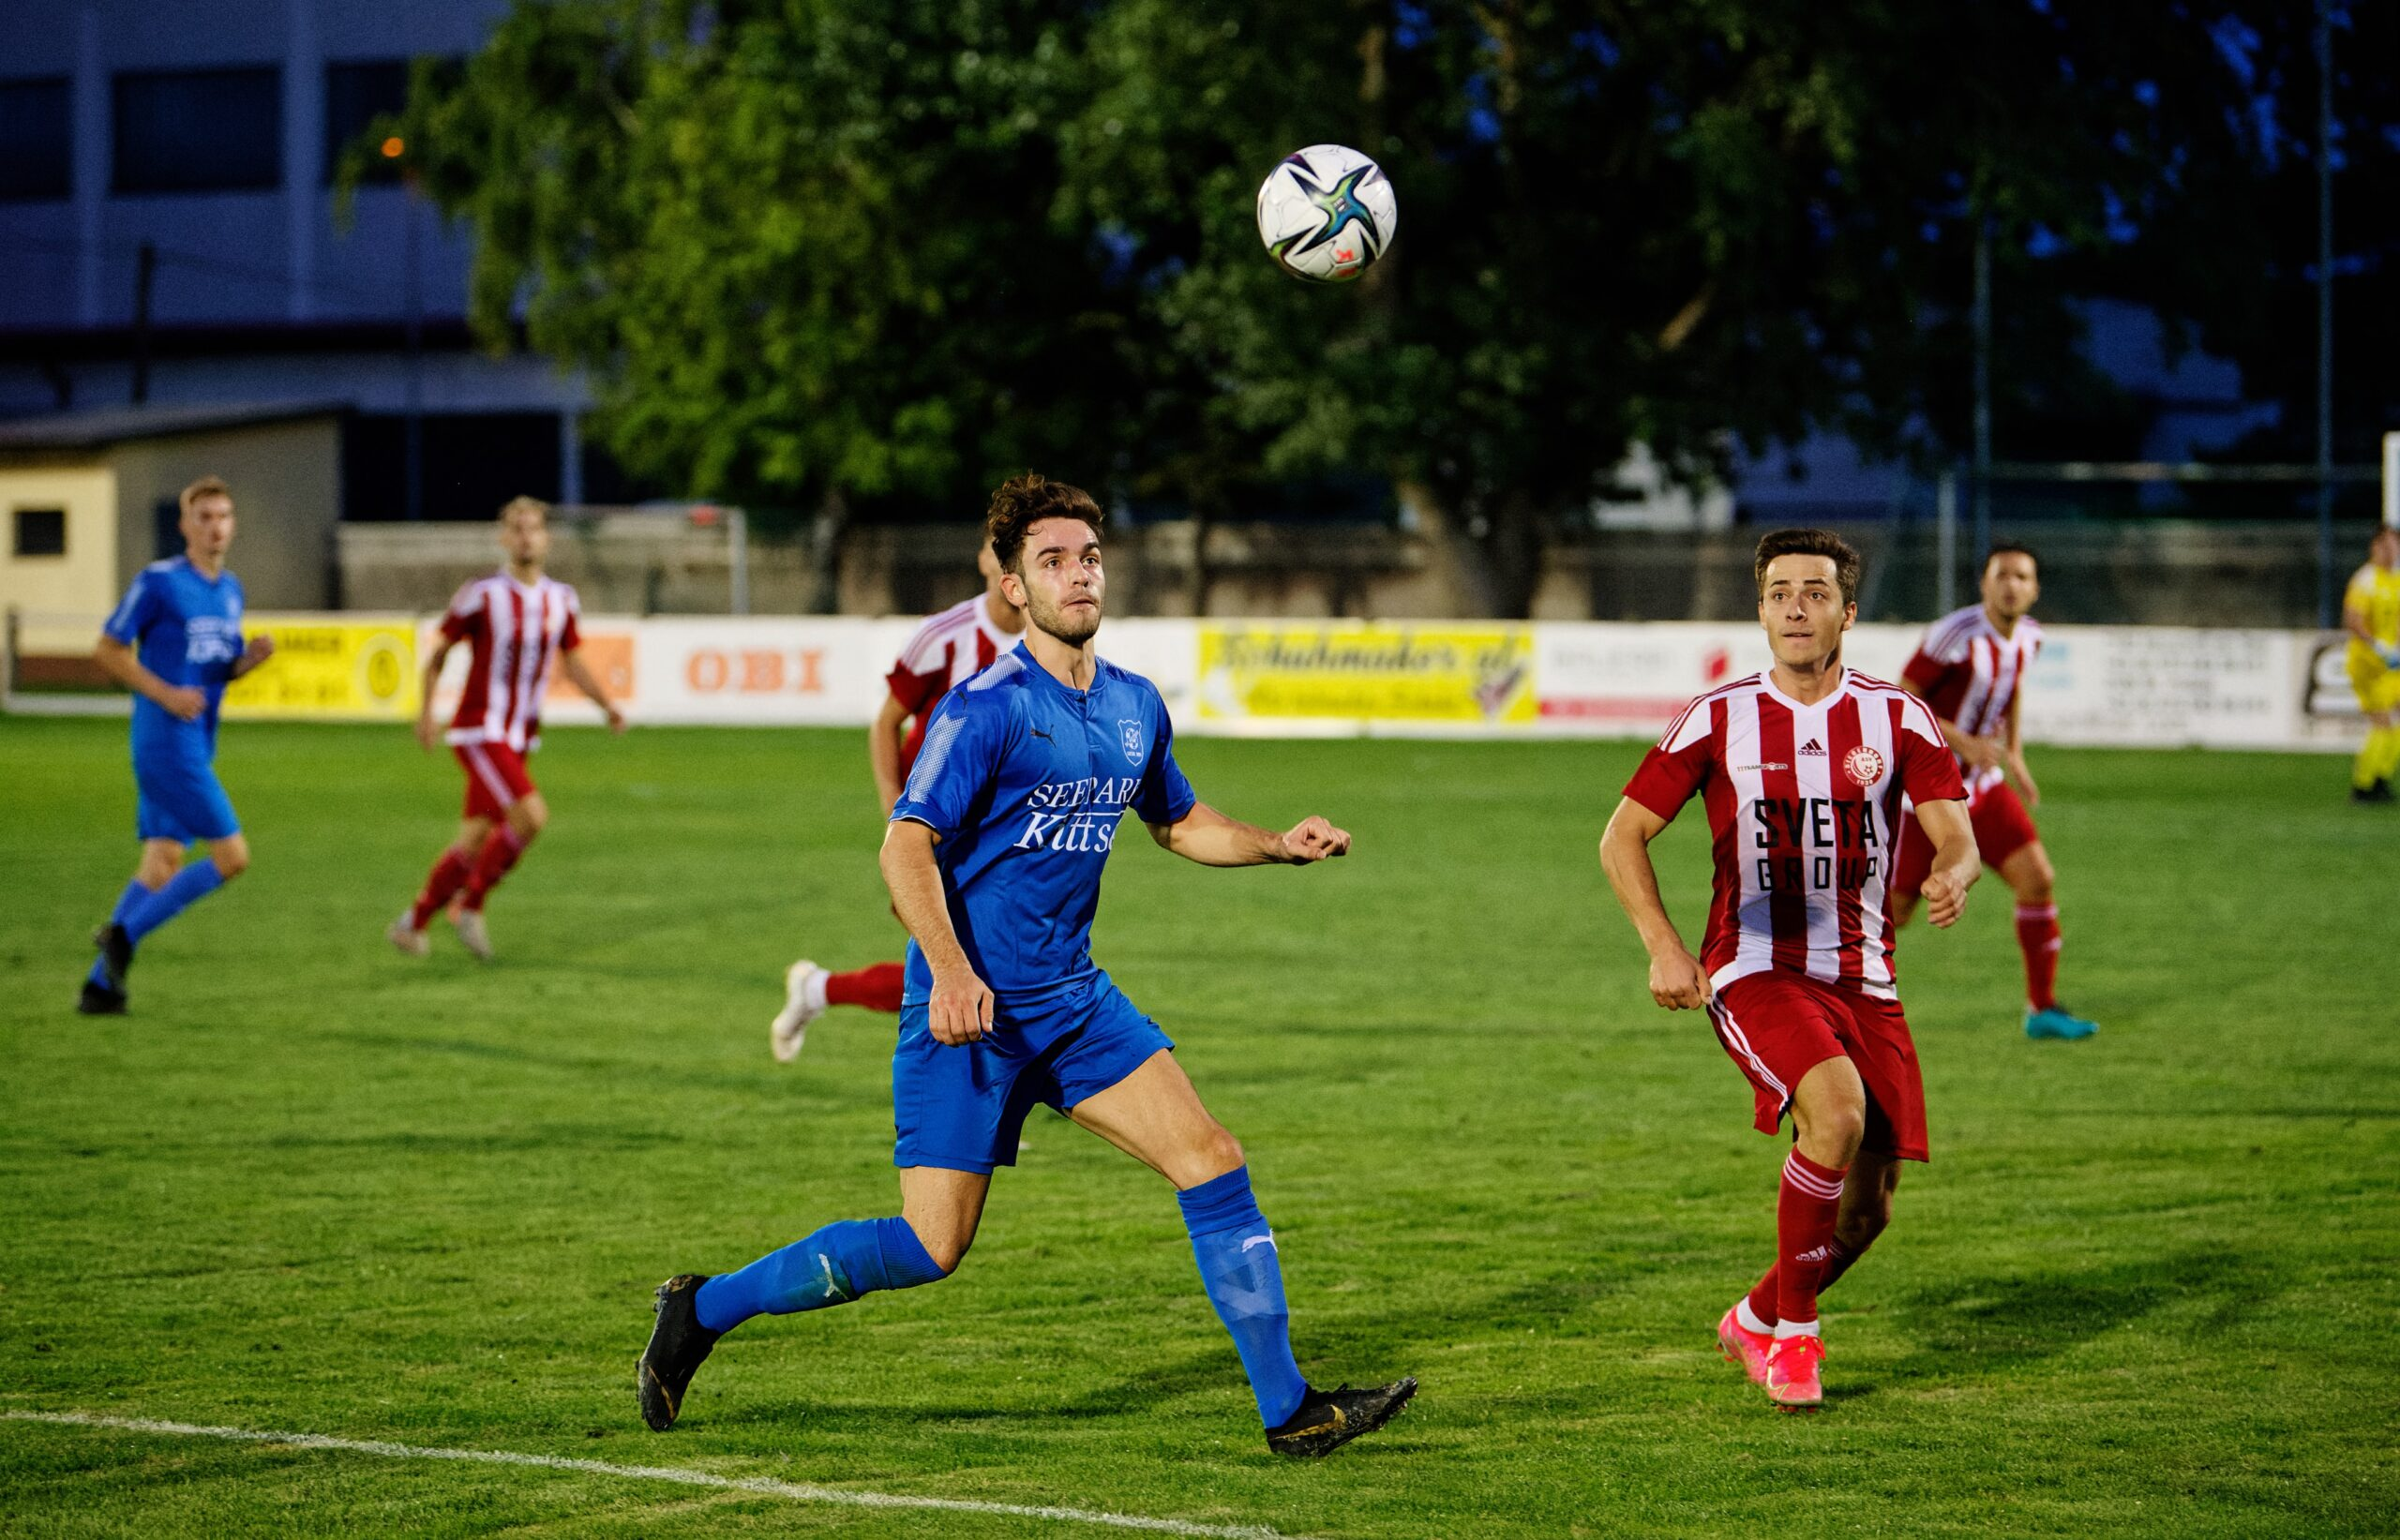 Florian Kovacs defending Bastian Lehner